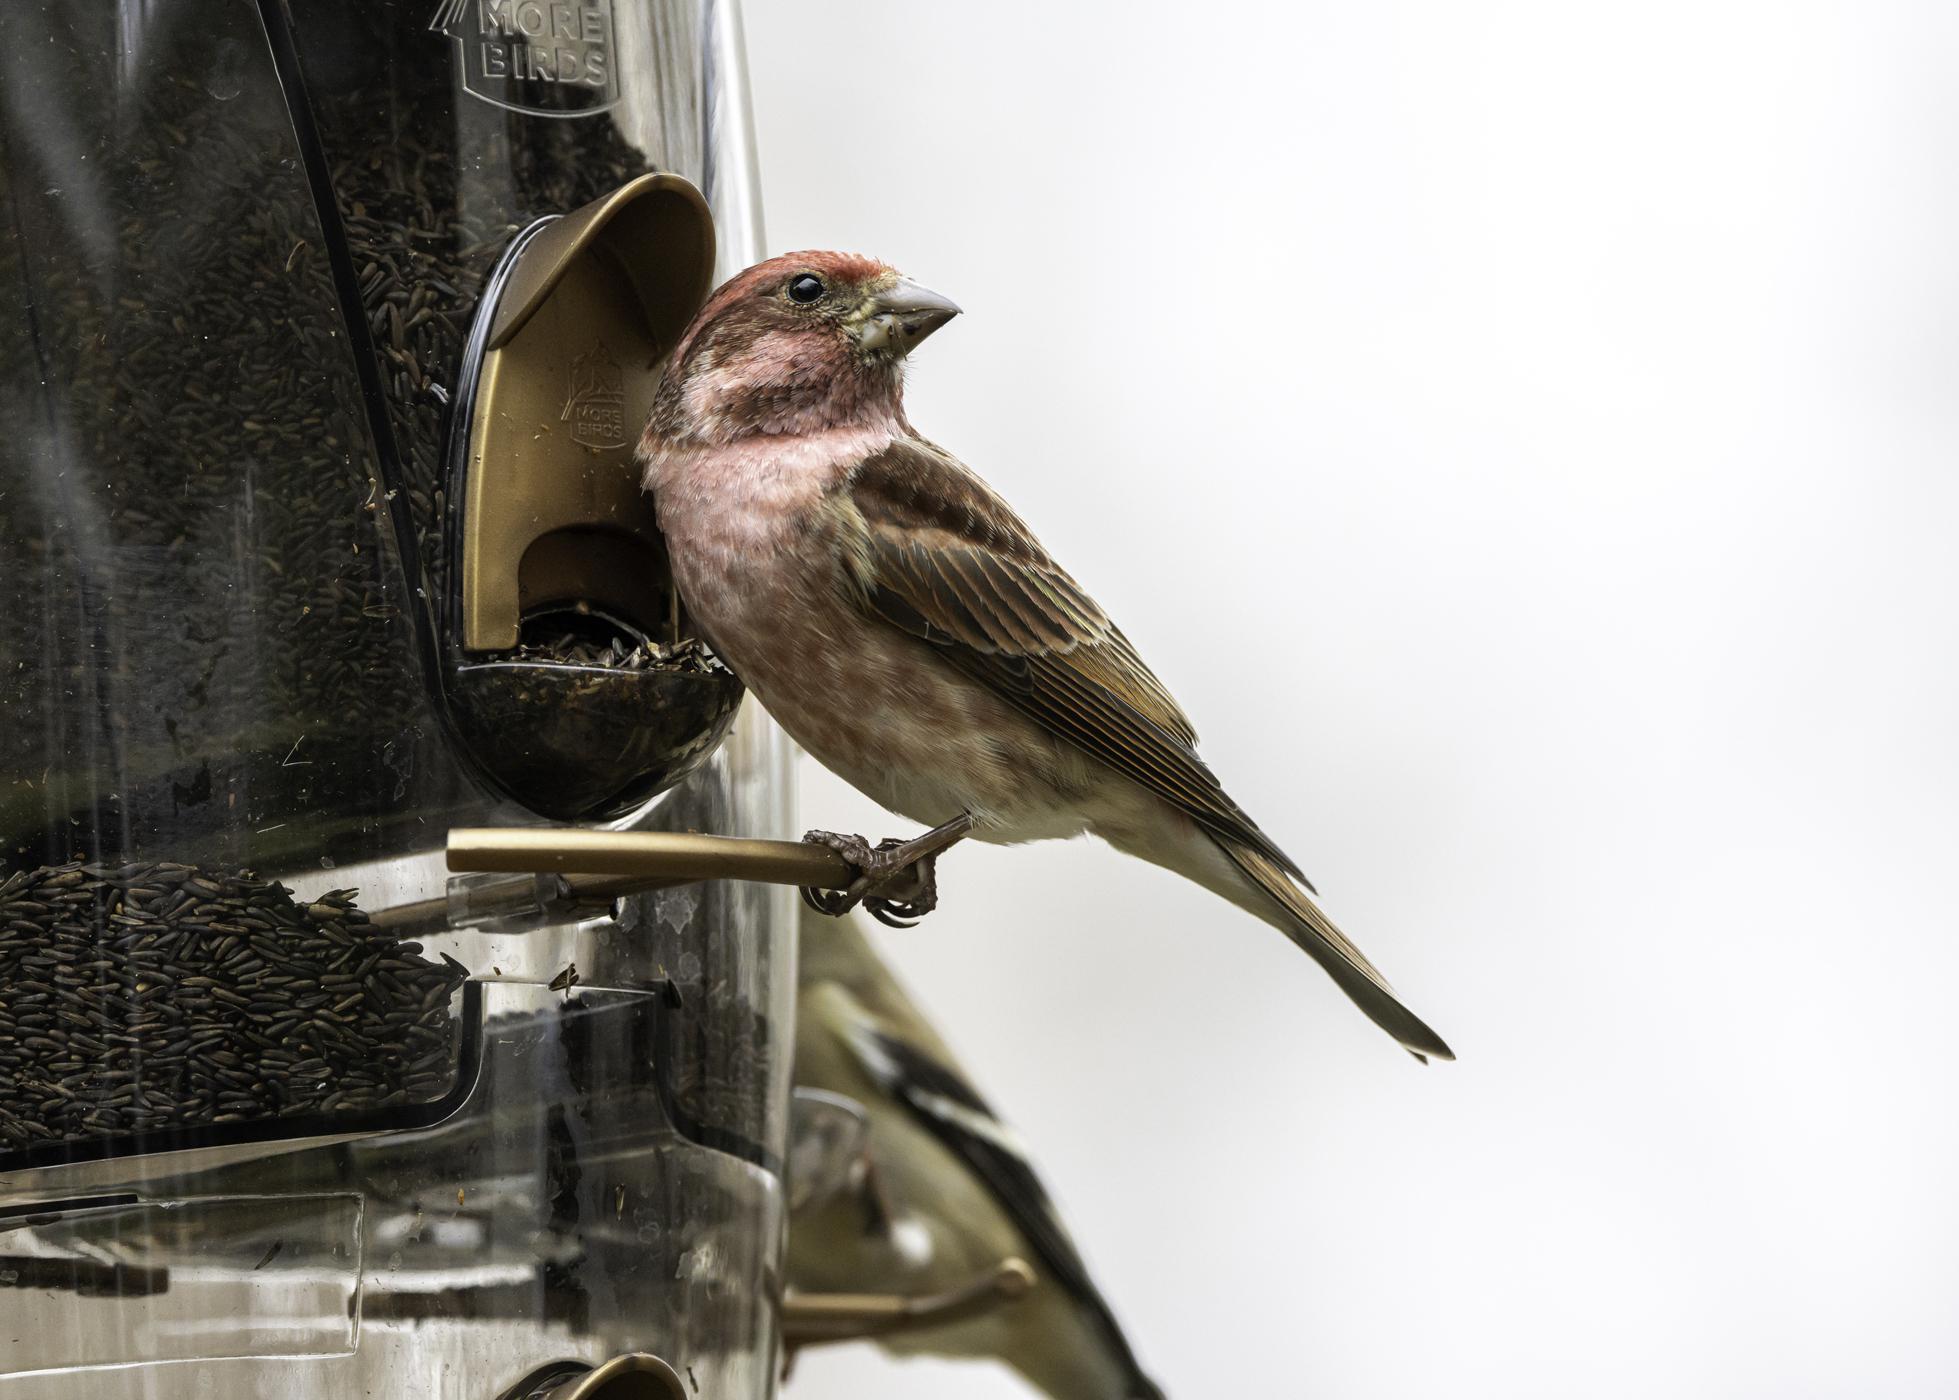 A bird eats seed from a feeder.